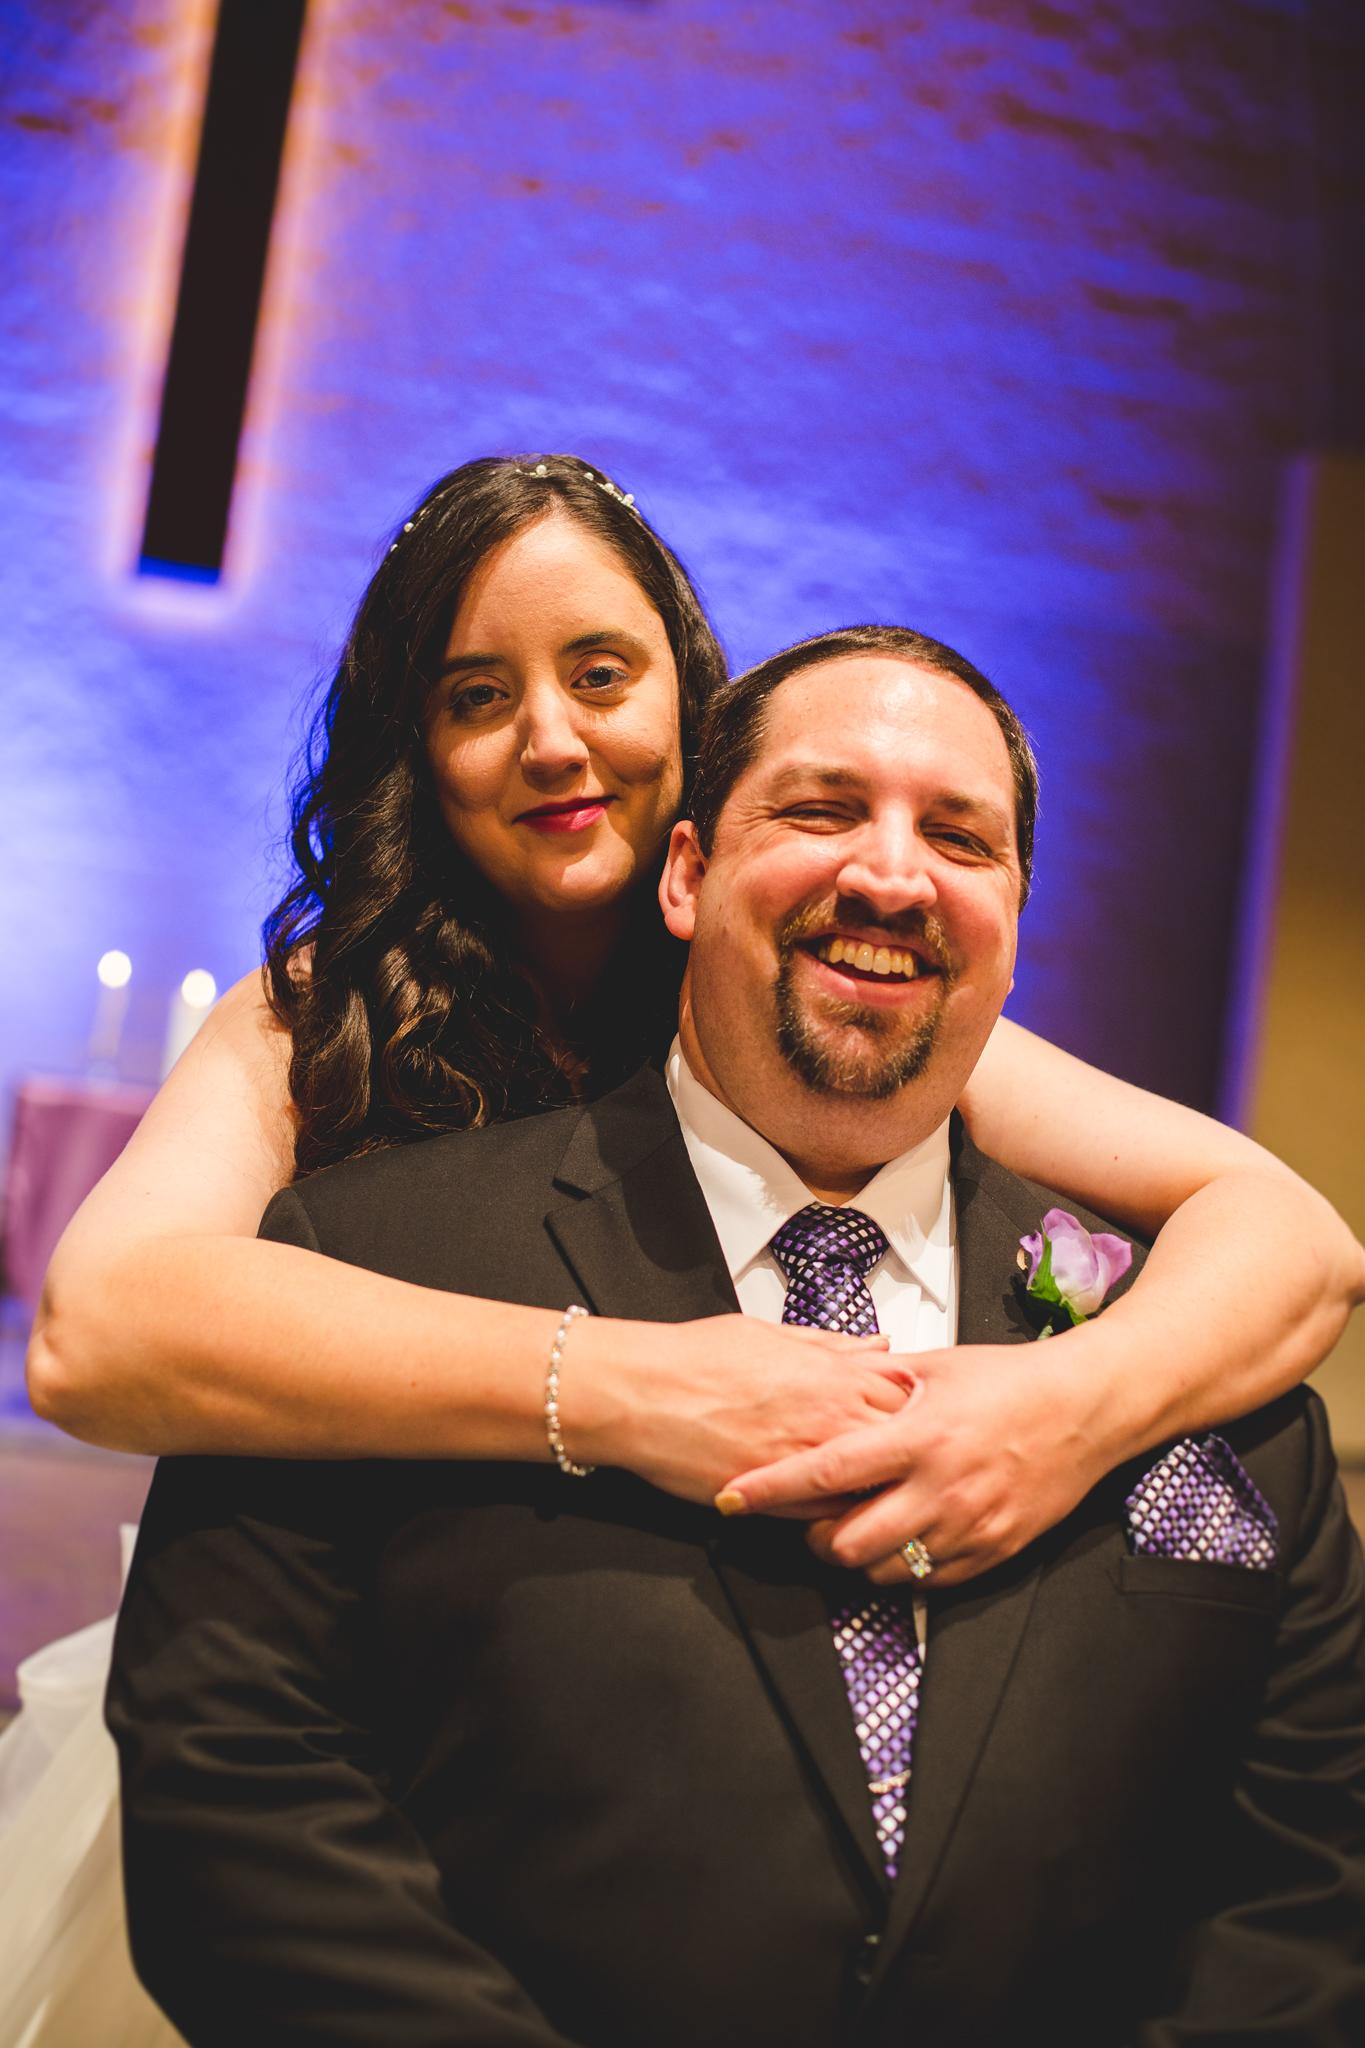 rs bride wraps arms around groom